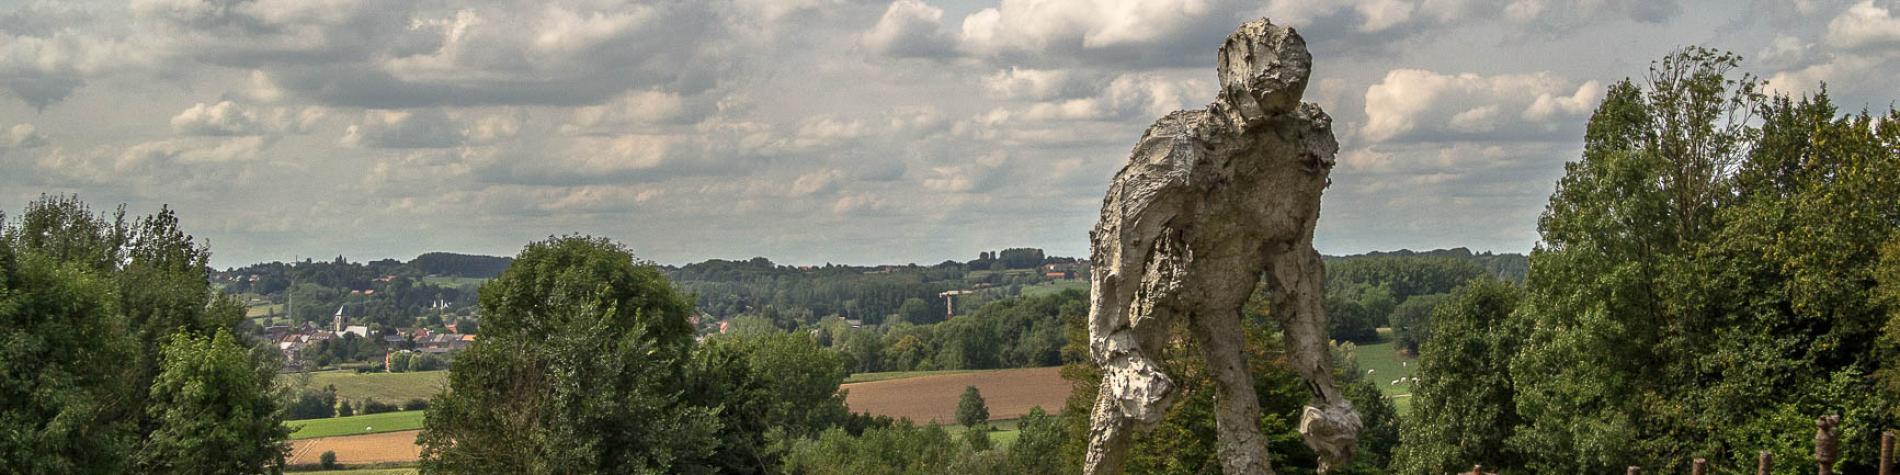 Balade à Ellezelles - Belgique